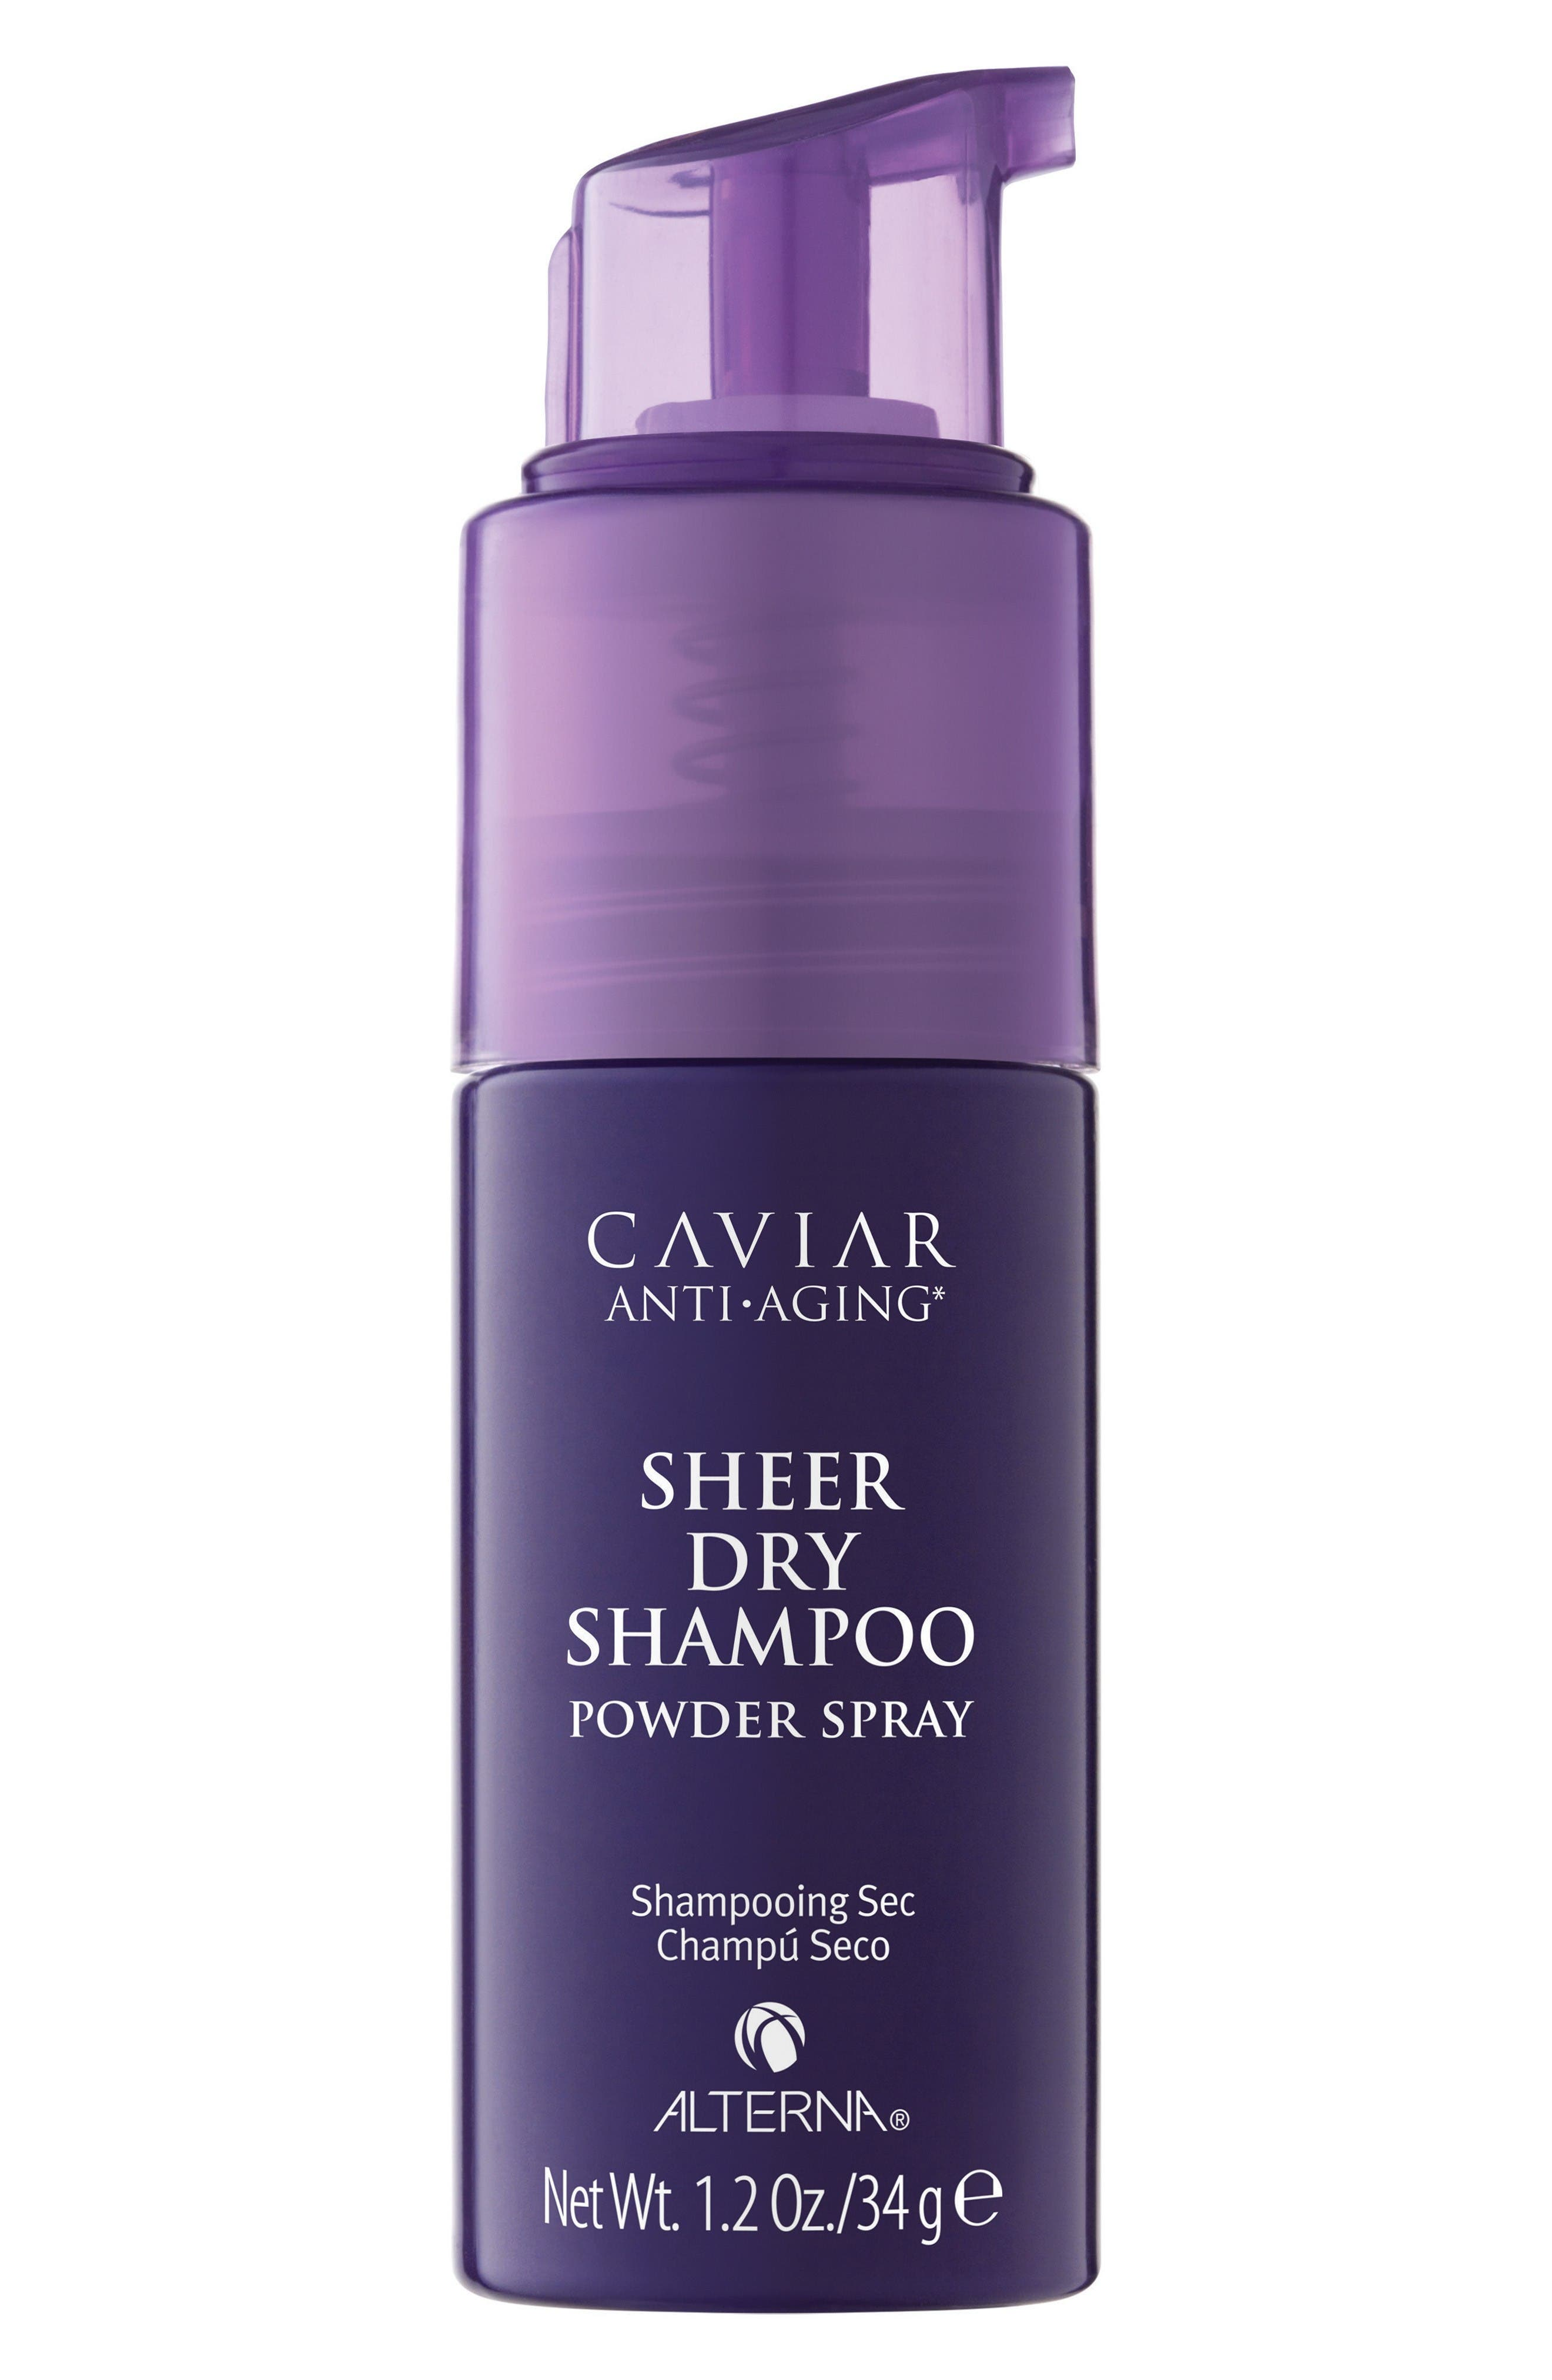 ALTERNA® Caviar Sheer Dry Shampoo